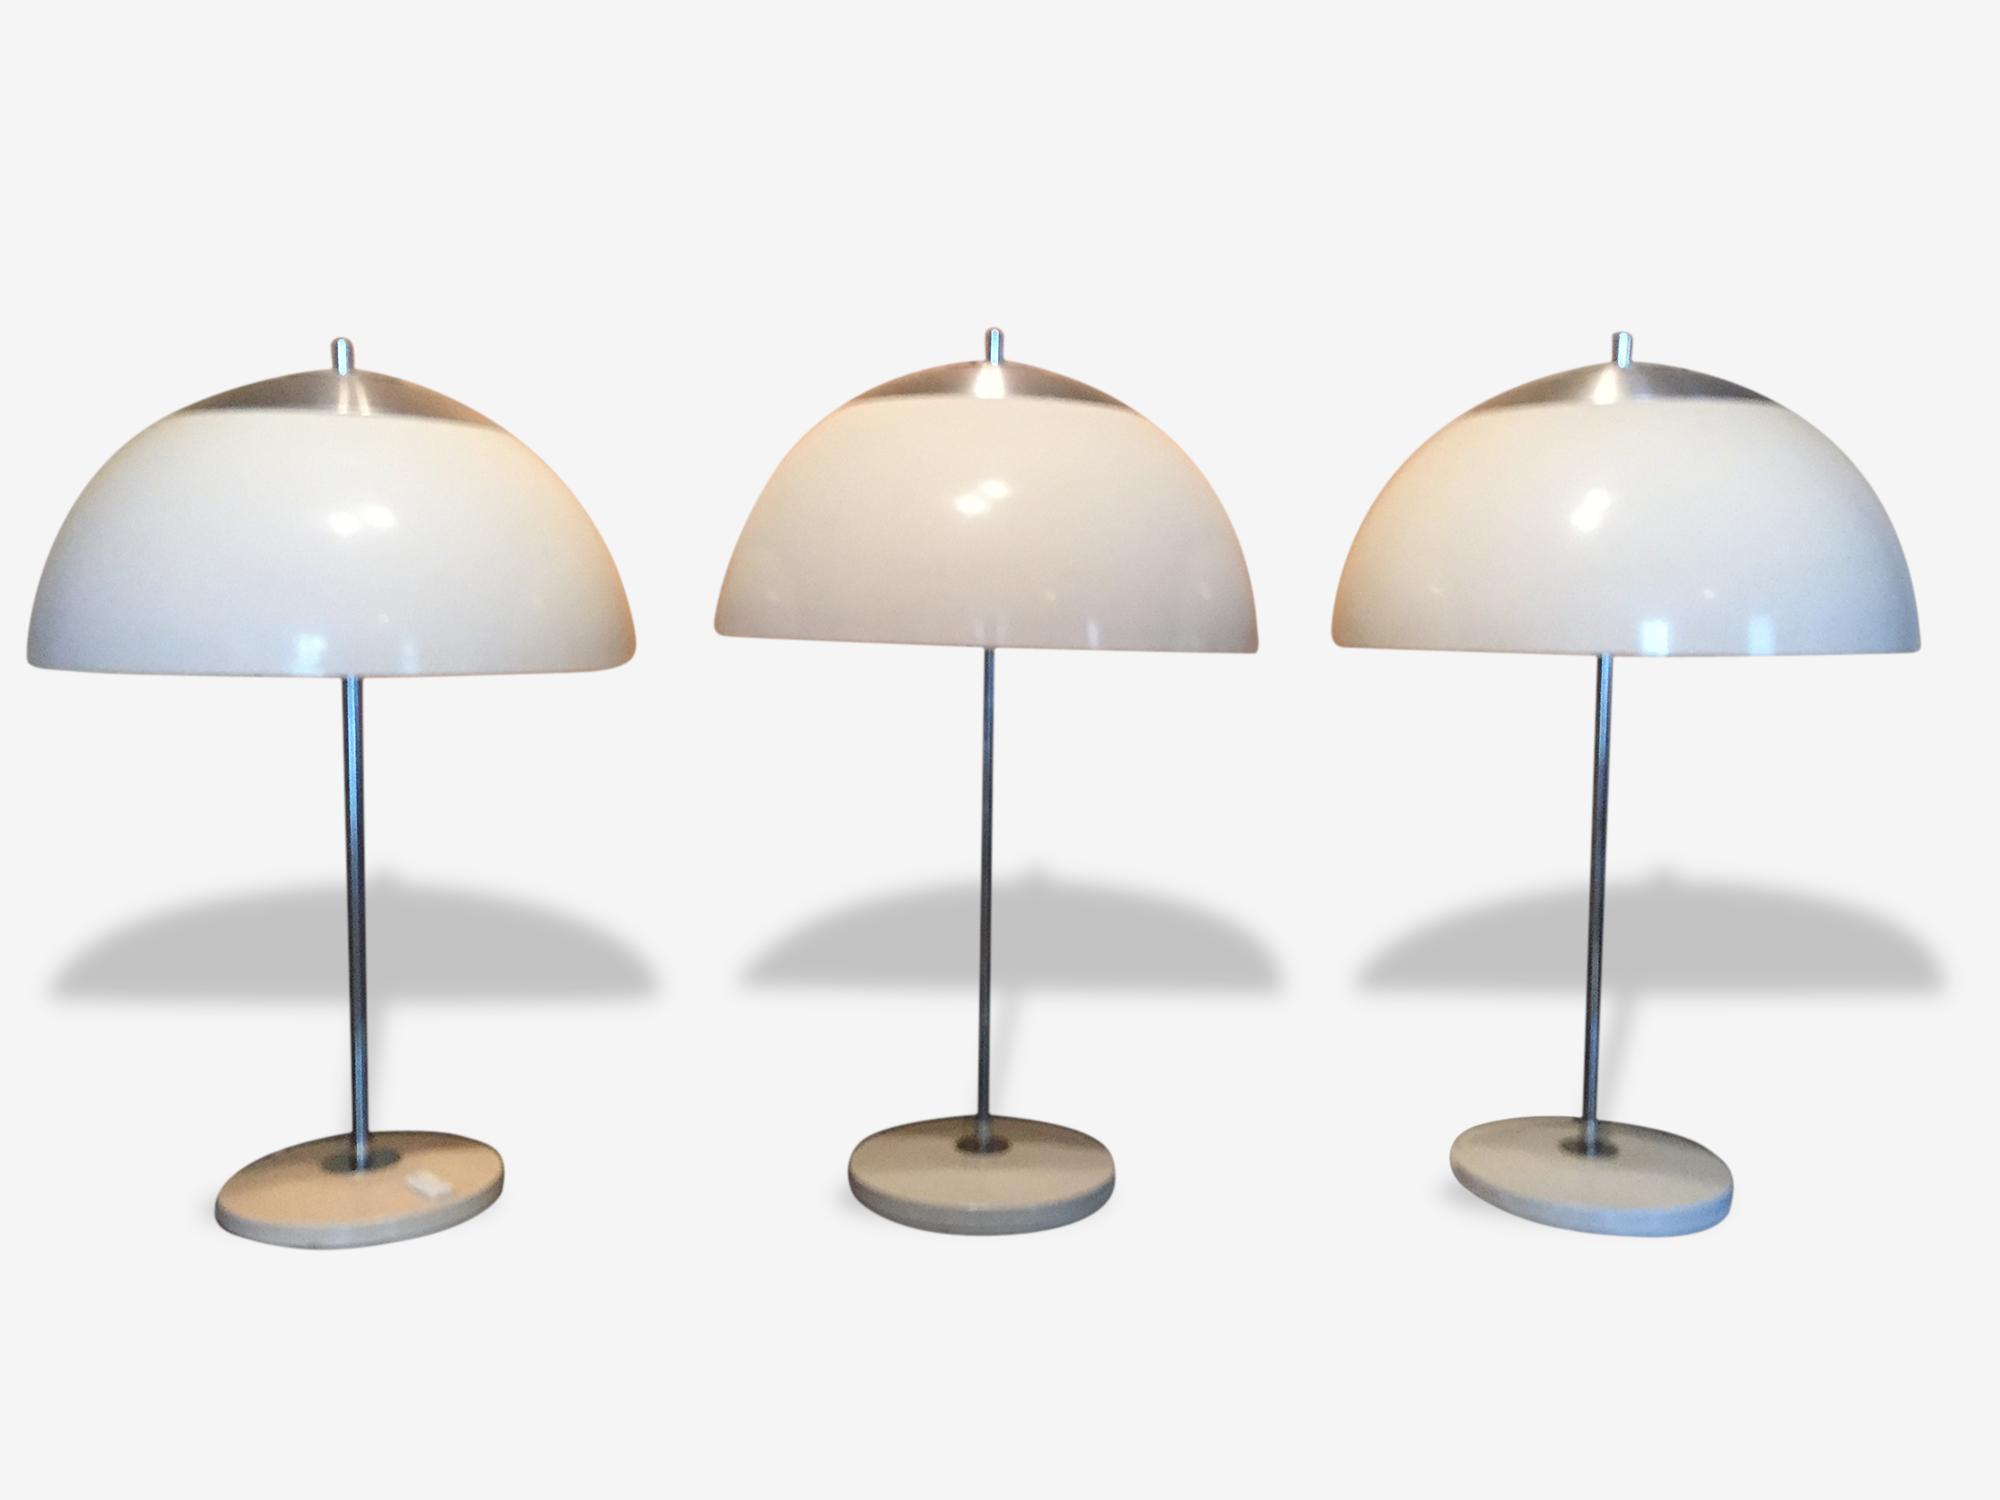 Lampe Champignon Vintage Unilux Plastic White Design 17382